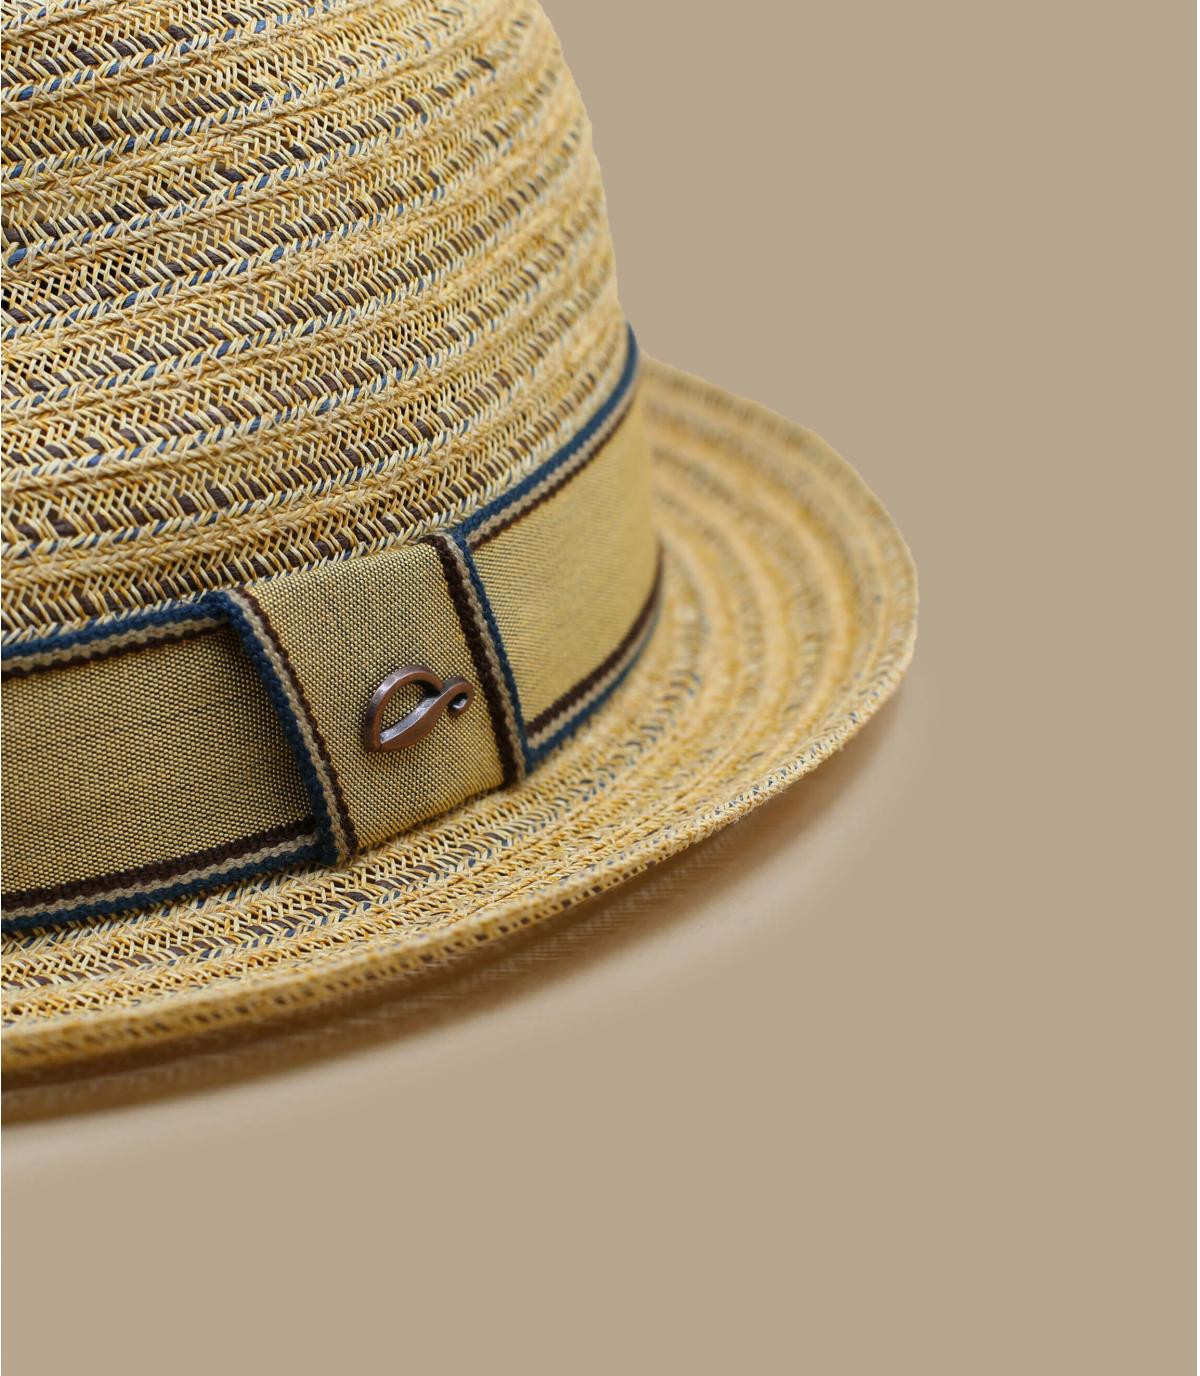 Details Newman Toyo beige - afbeeling 3